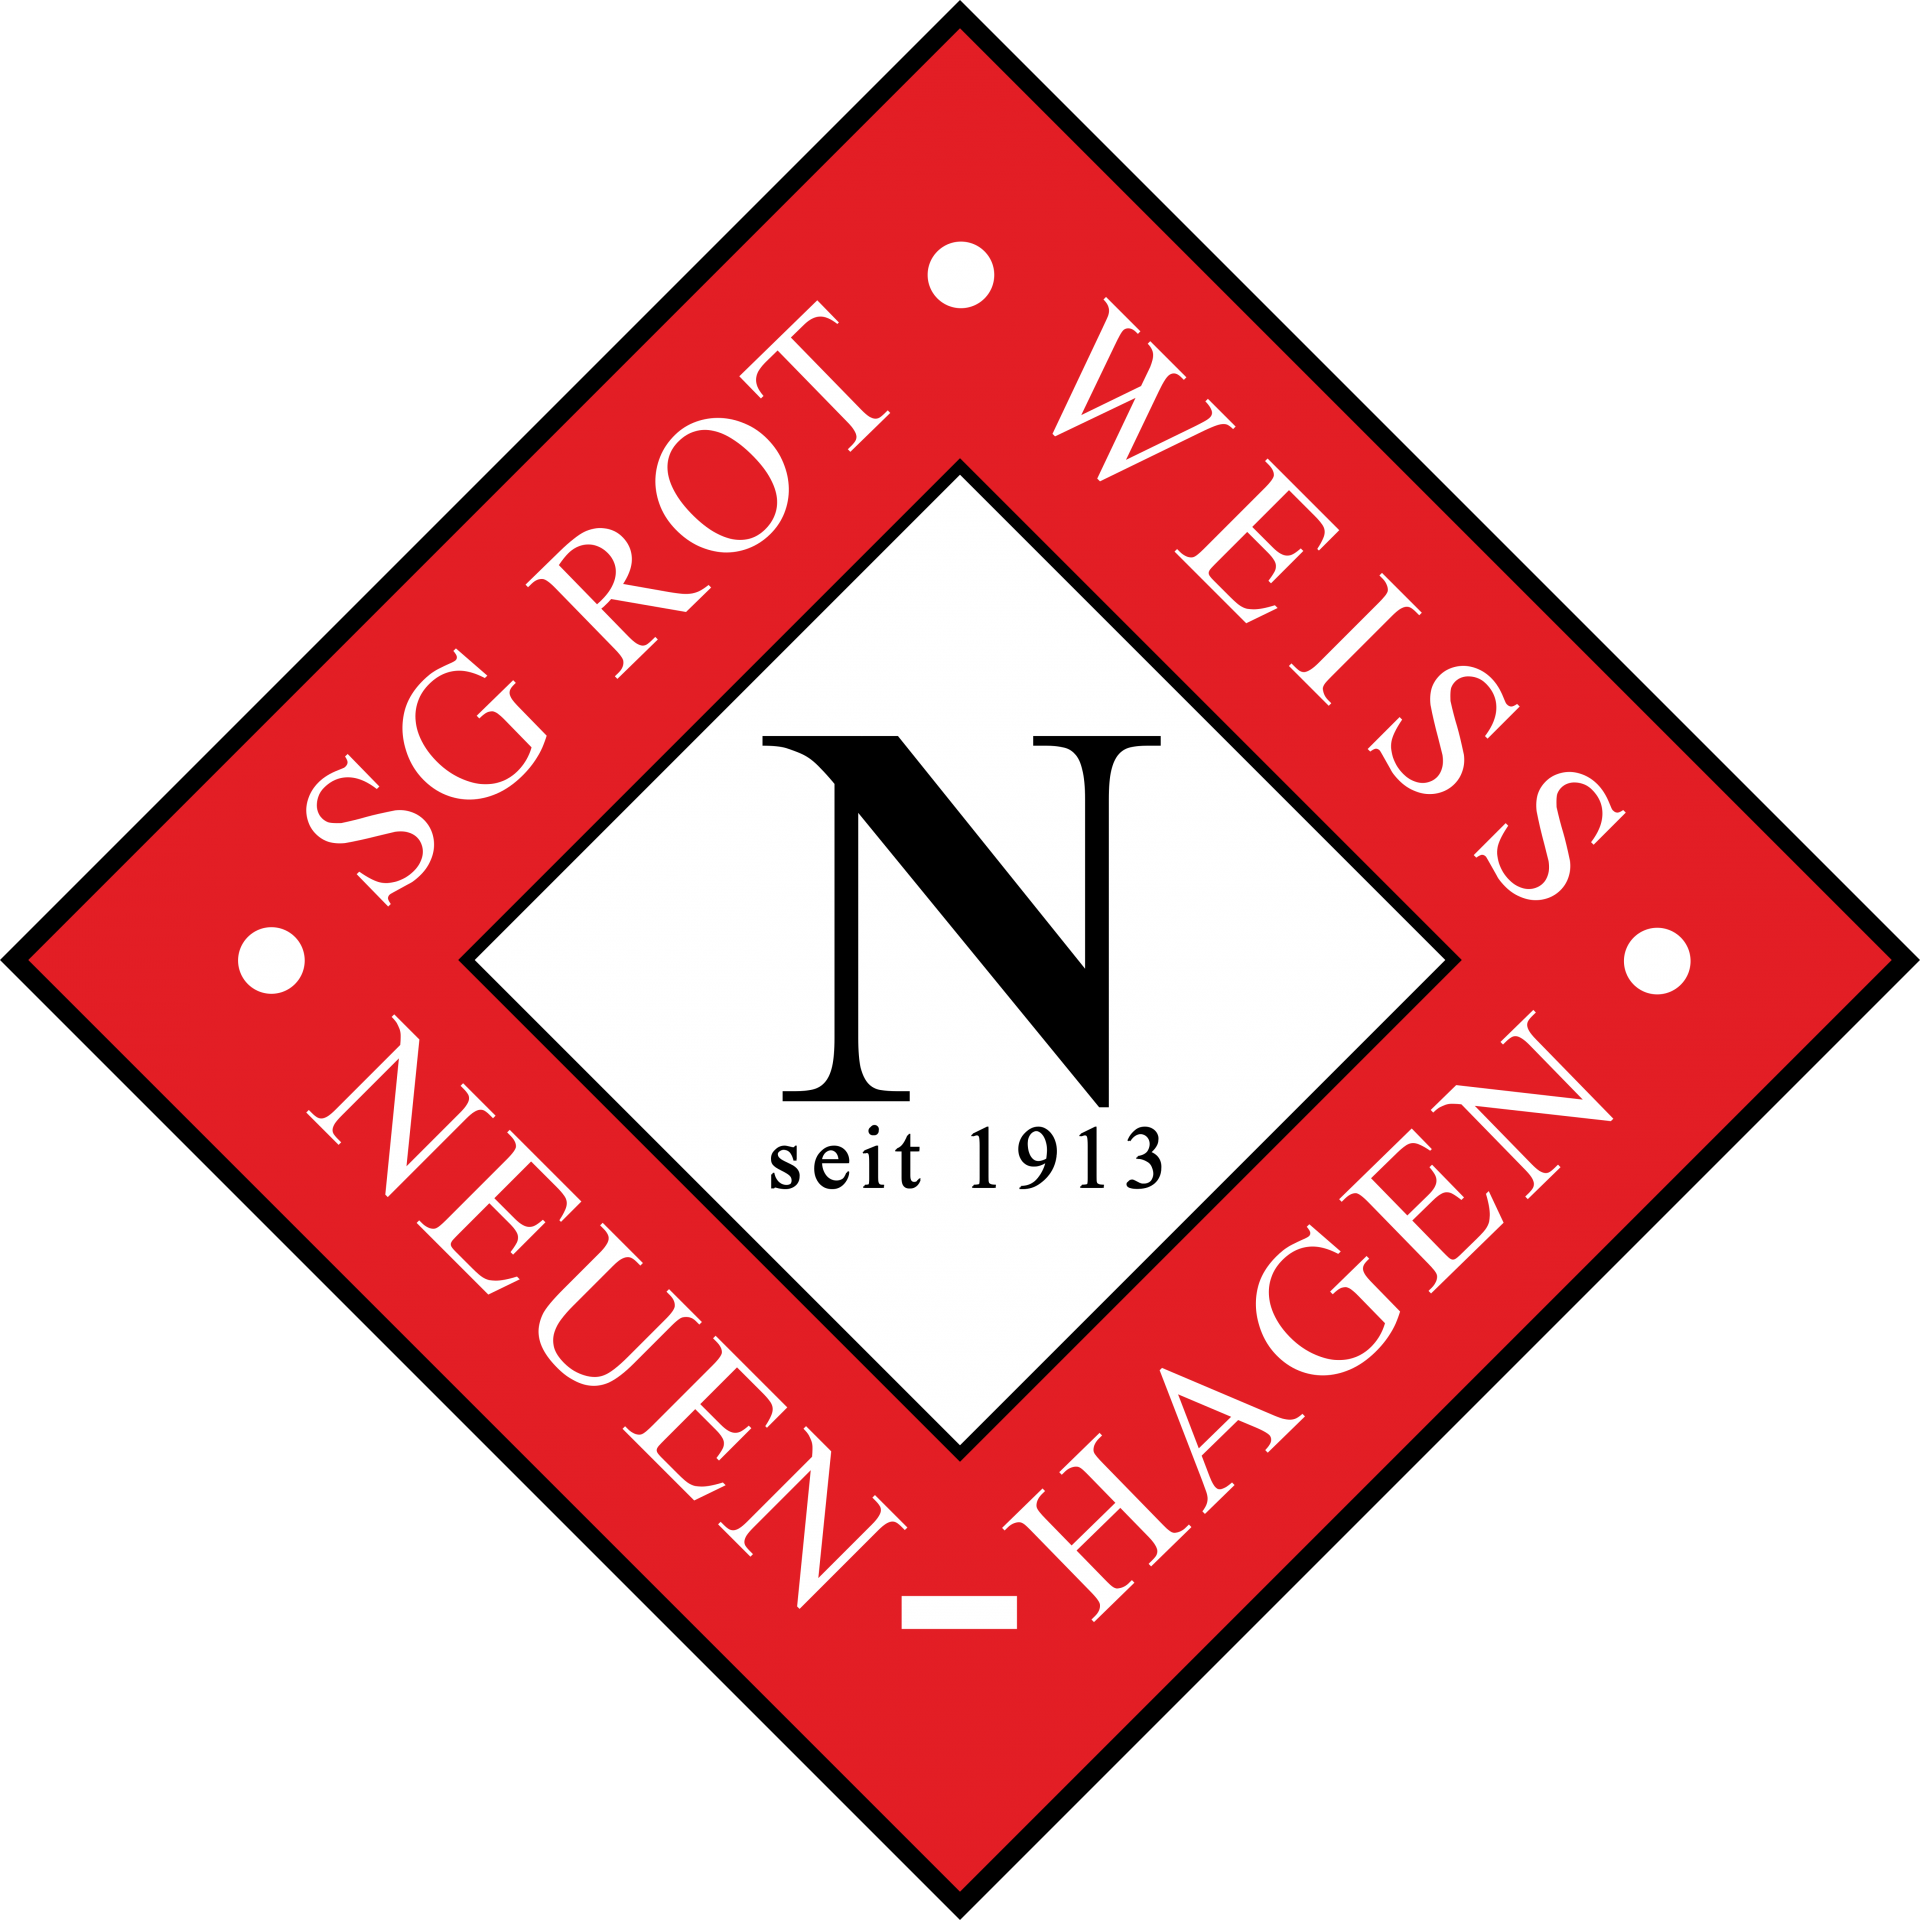 Logo des SG Rot-Weiß Neuenhagen e.V.